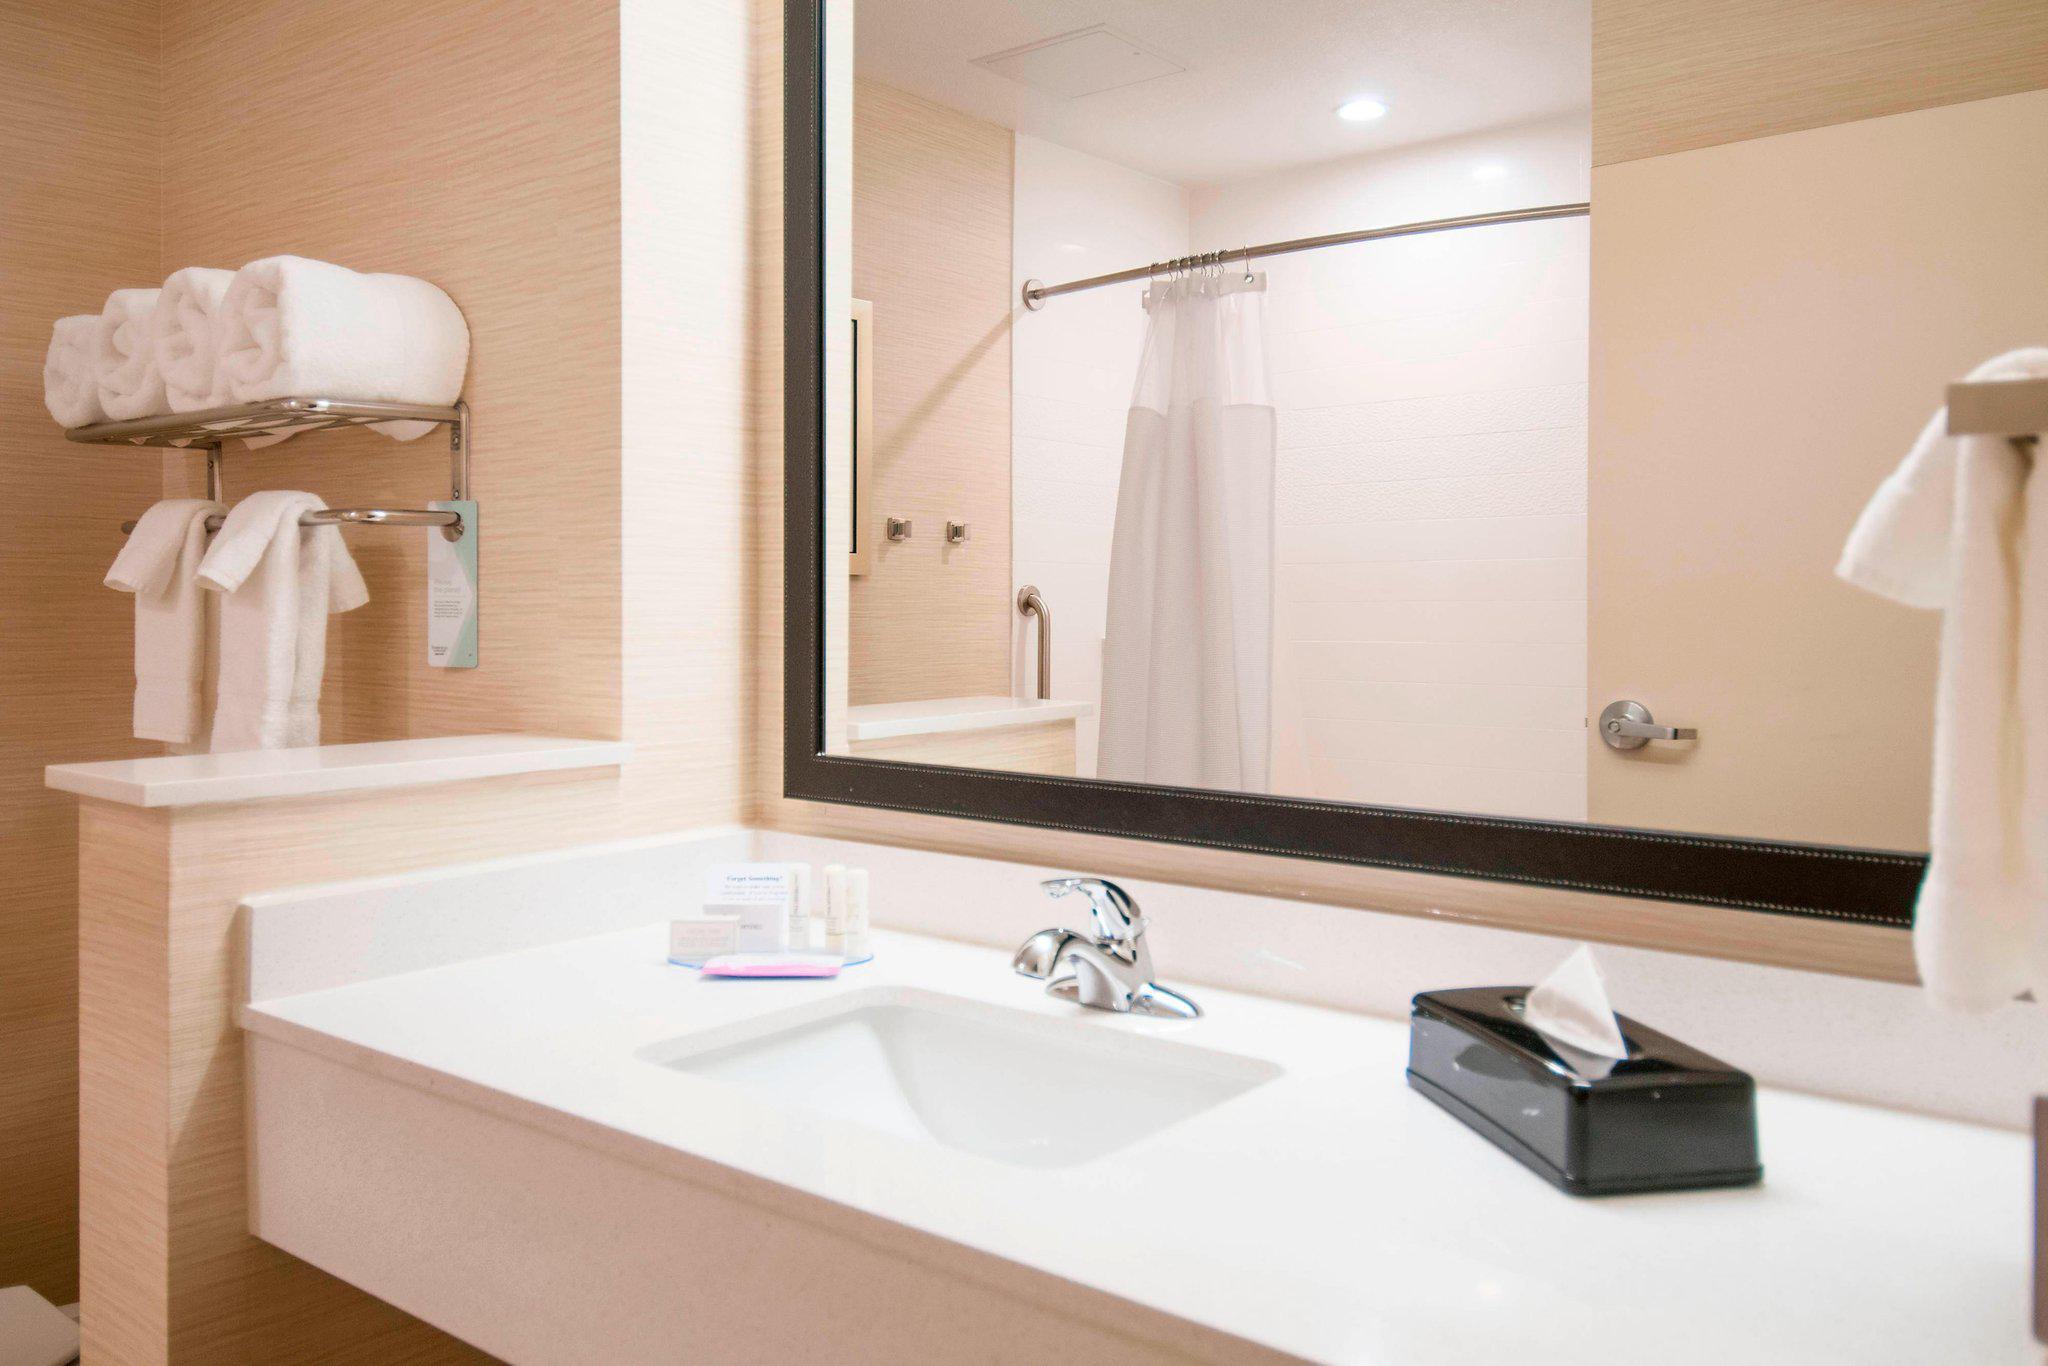 Fairfield Inn & Suites by Marriott San Antonio Brooks City Base